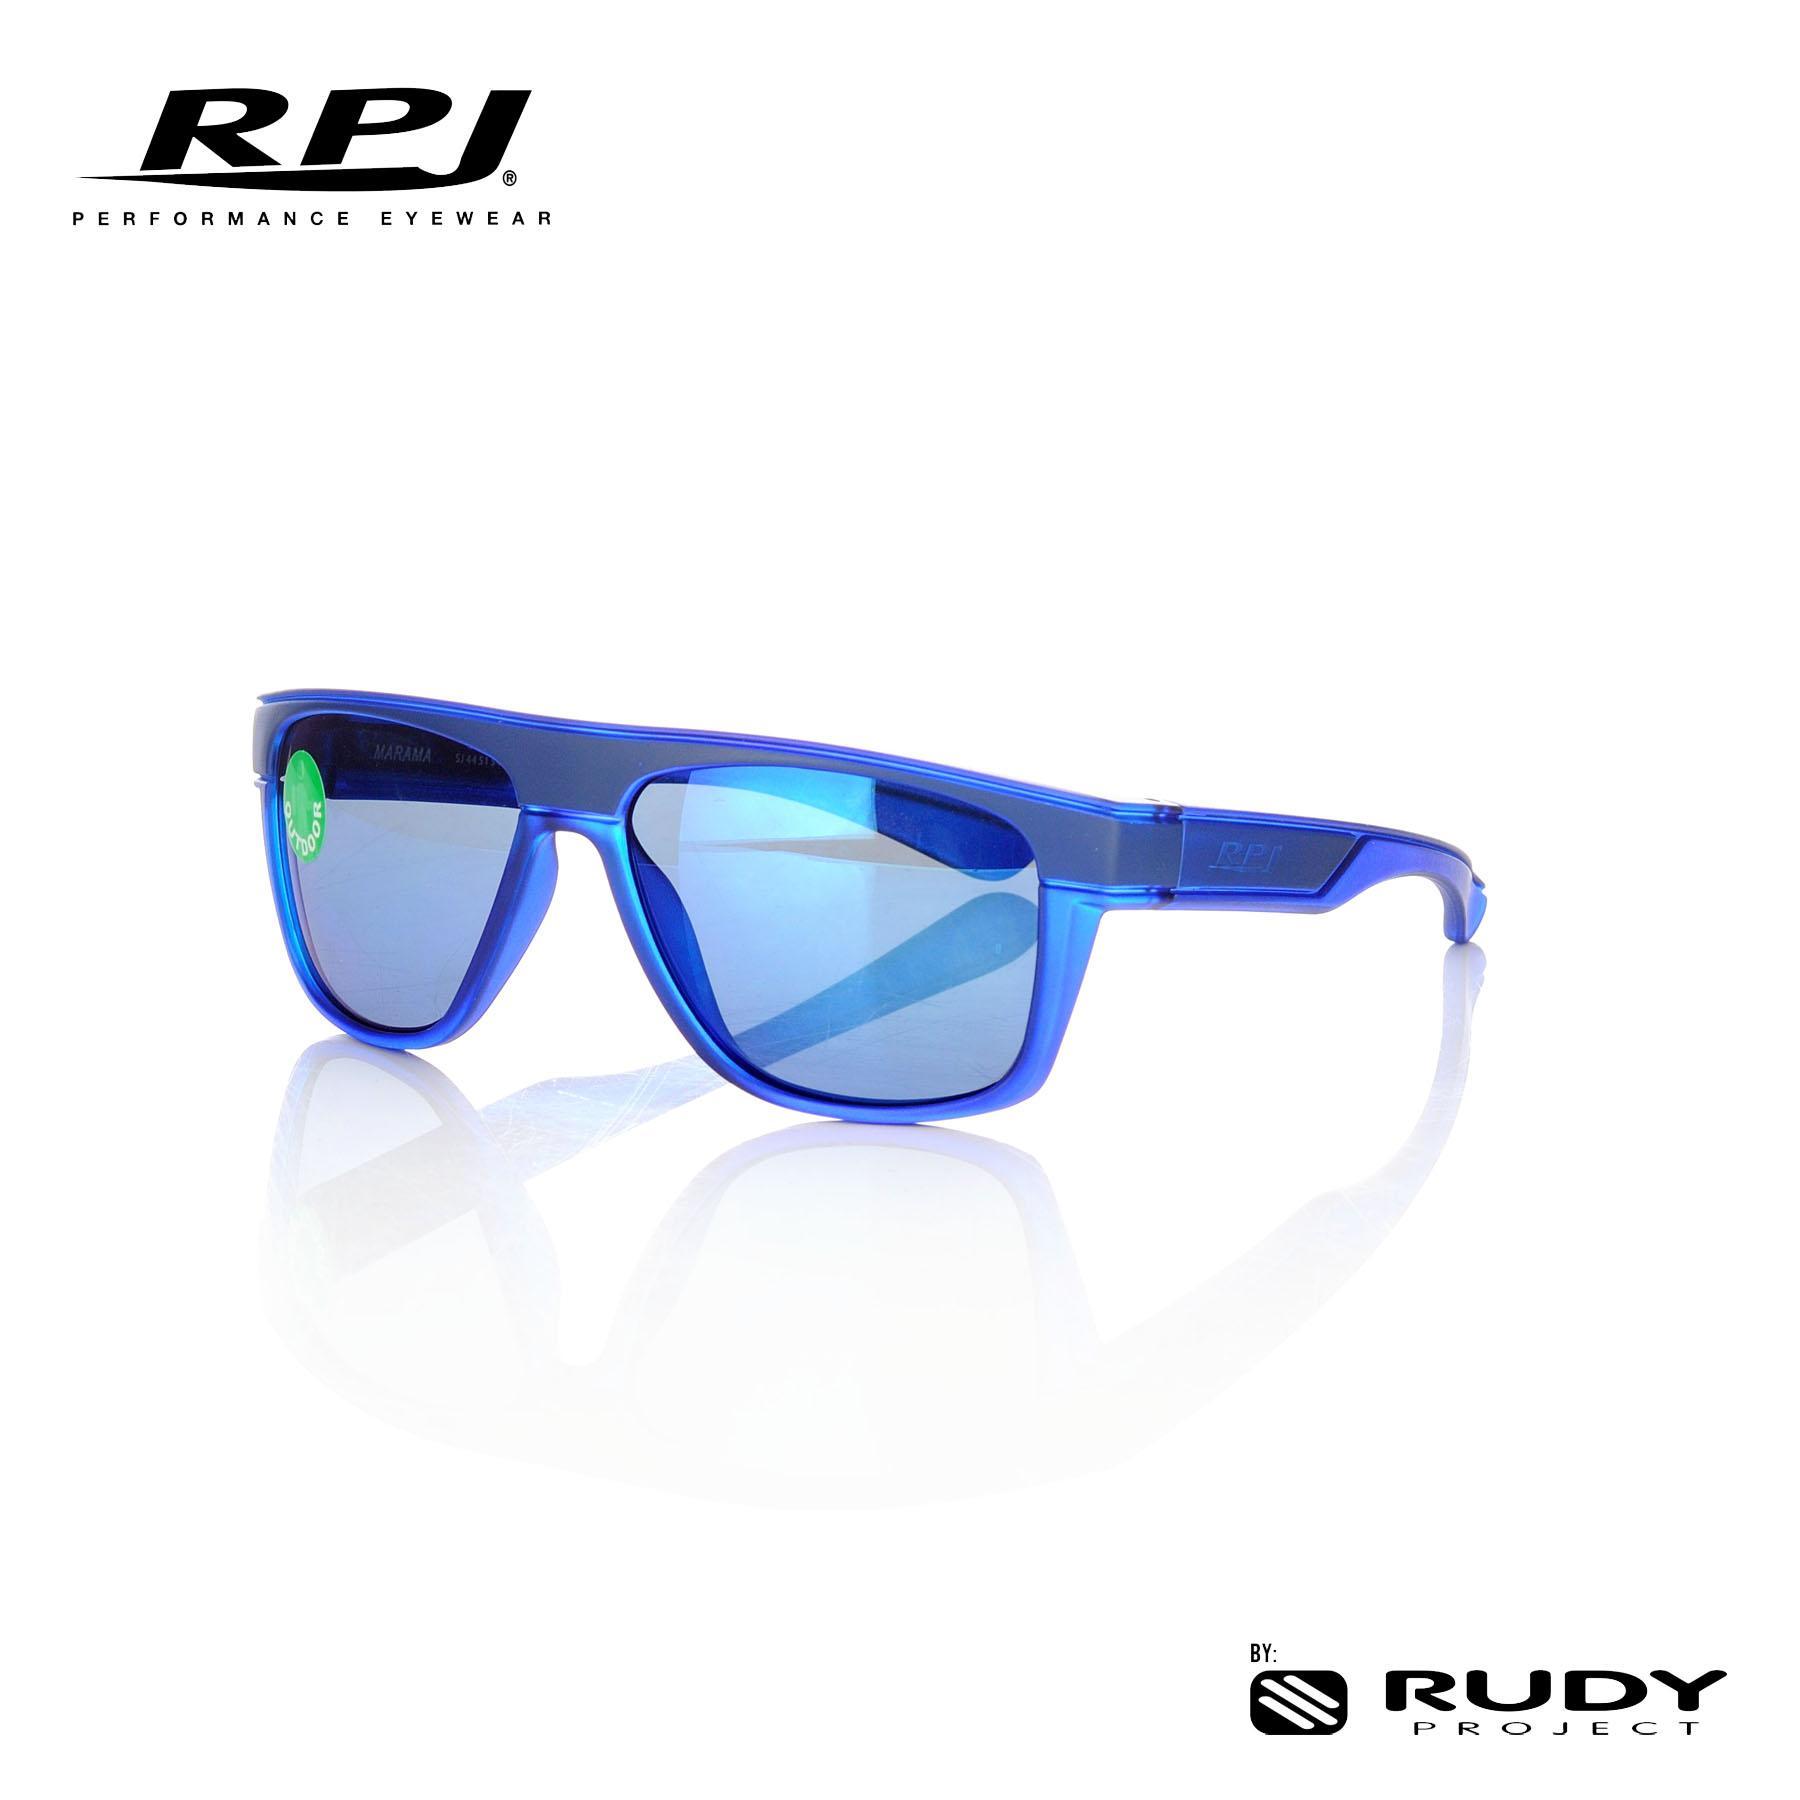 13f46eff16 Unisex Sunglasses for sale - Simple Sunglasses online brands